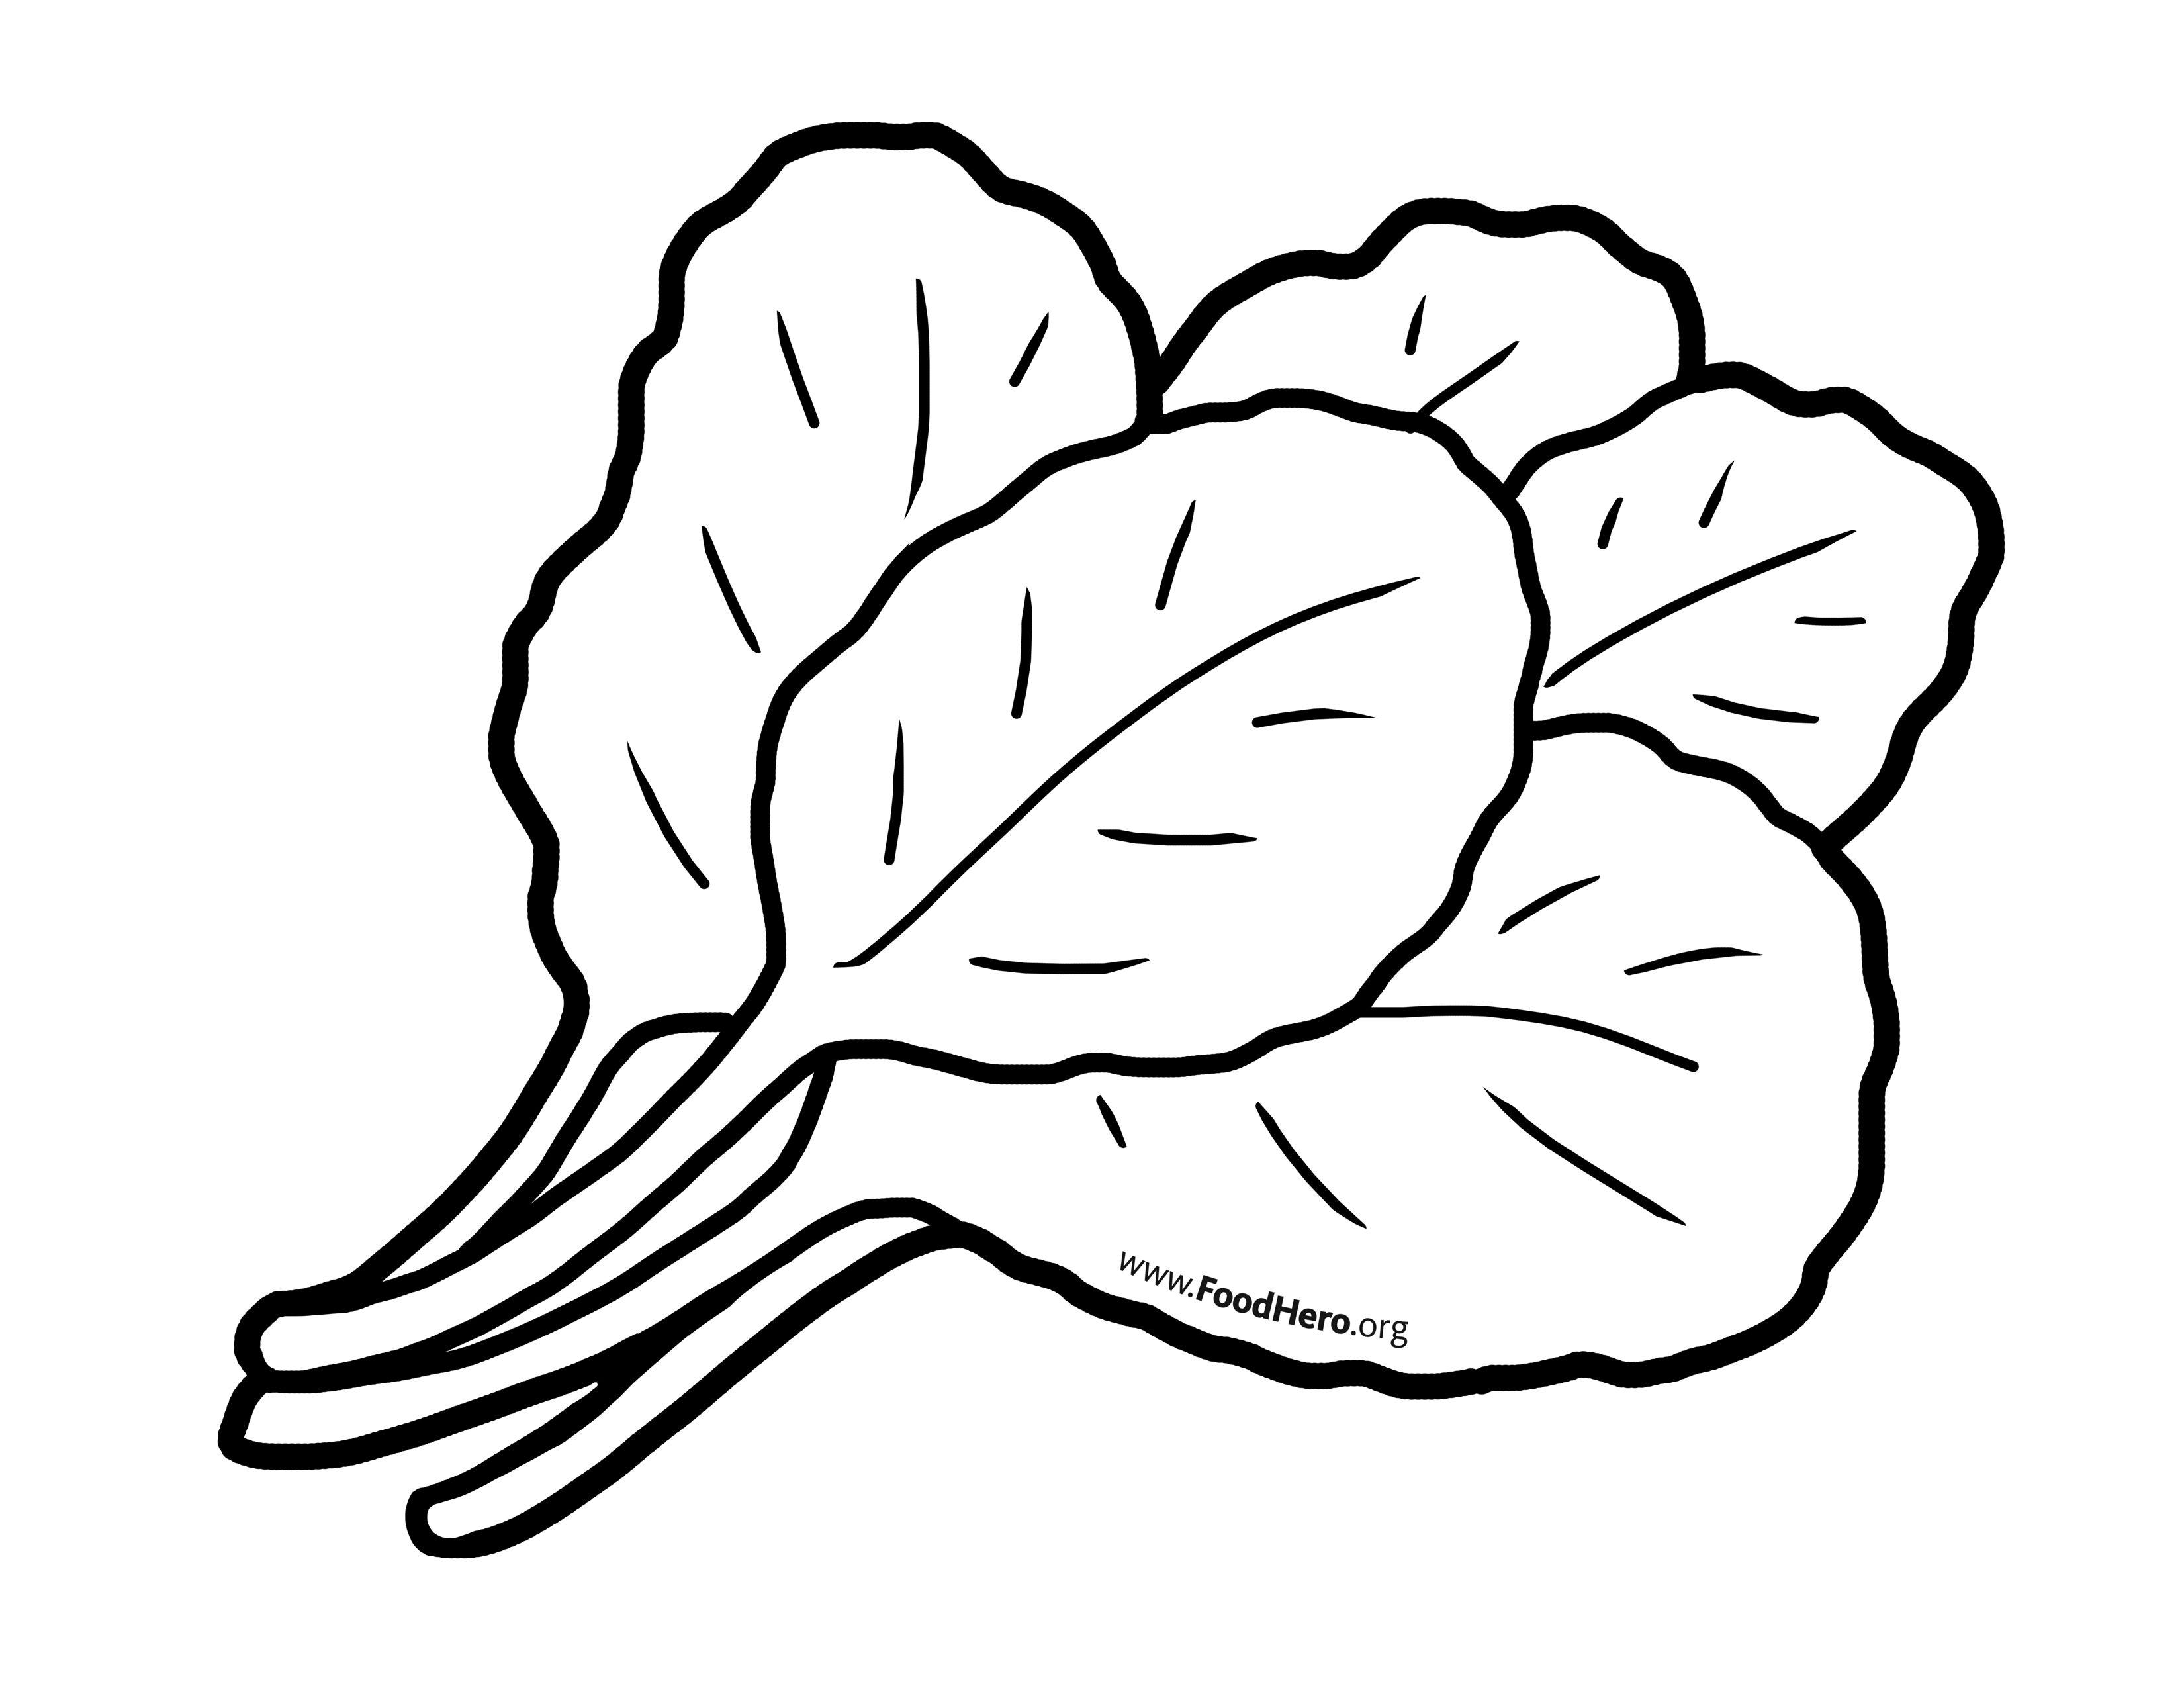 Chollard Greens illustration. #foodhero #bullentinboards #artwork ...